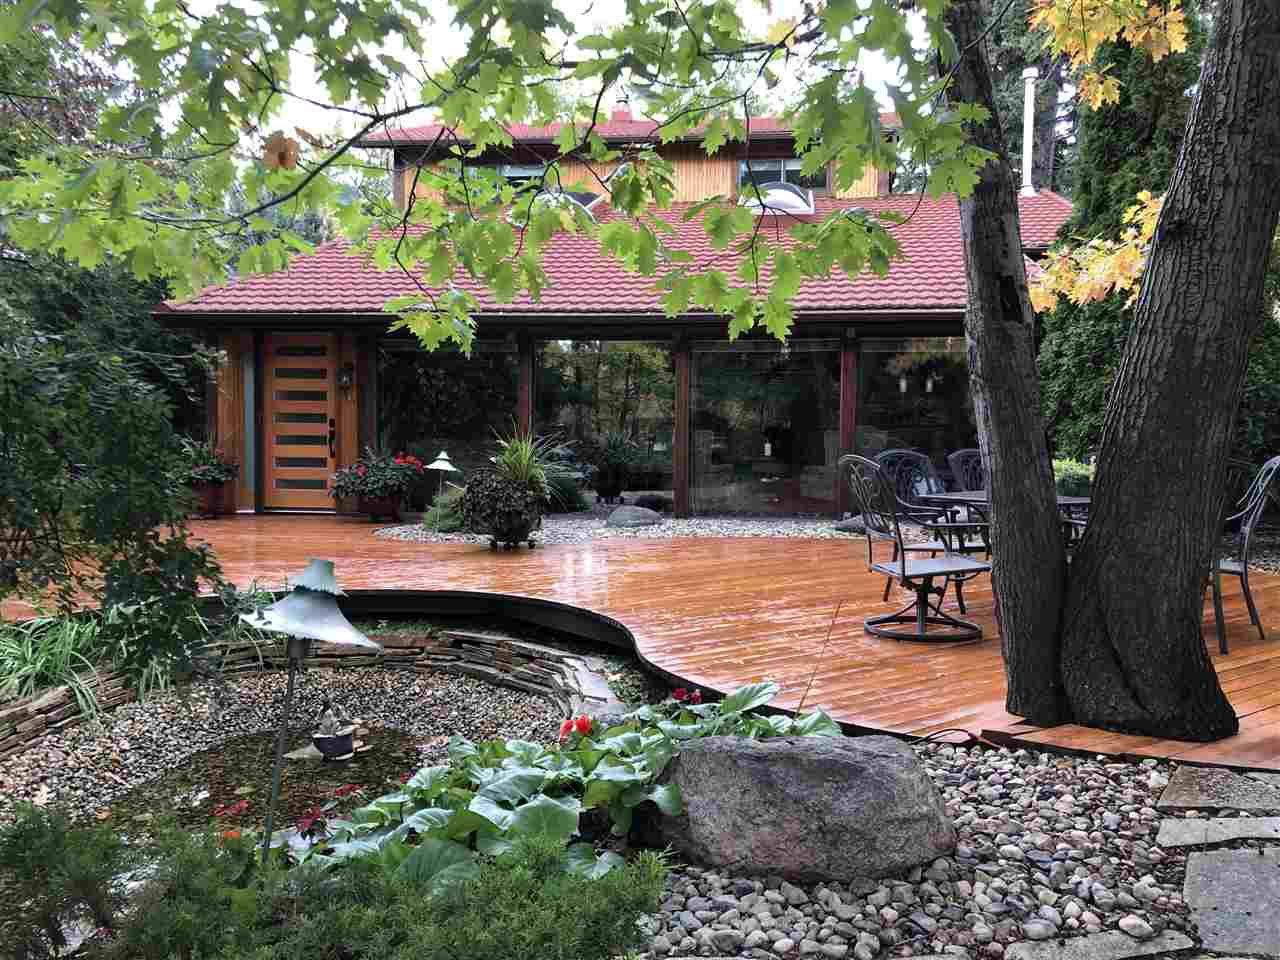 Main Photo: 14228 RAVINE Drive in Edmonton: Zone 21 House for sale : MLS®# E4175698